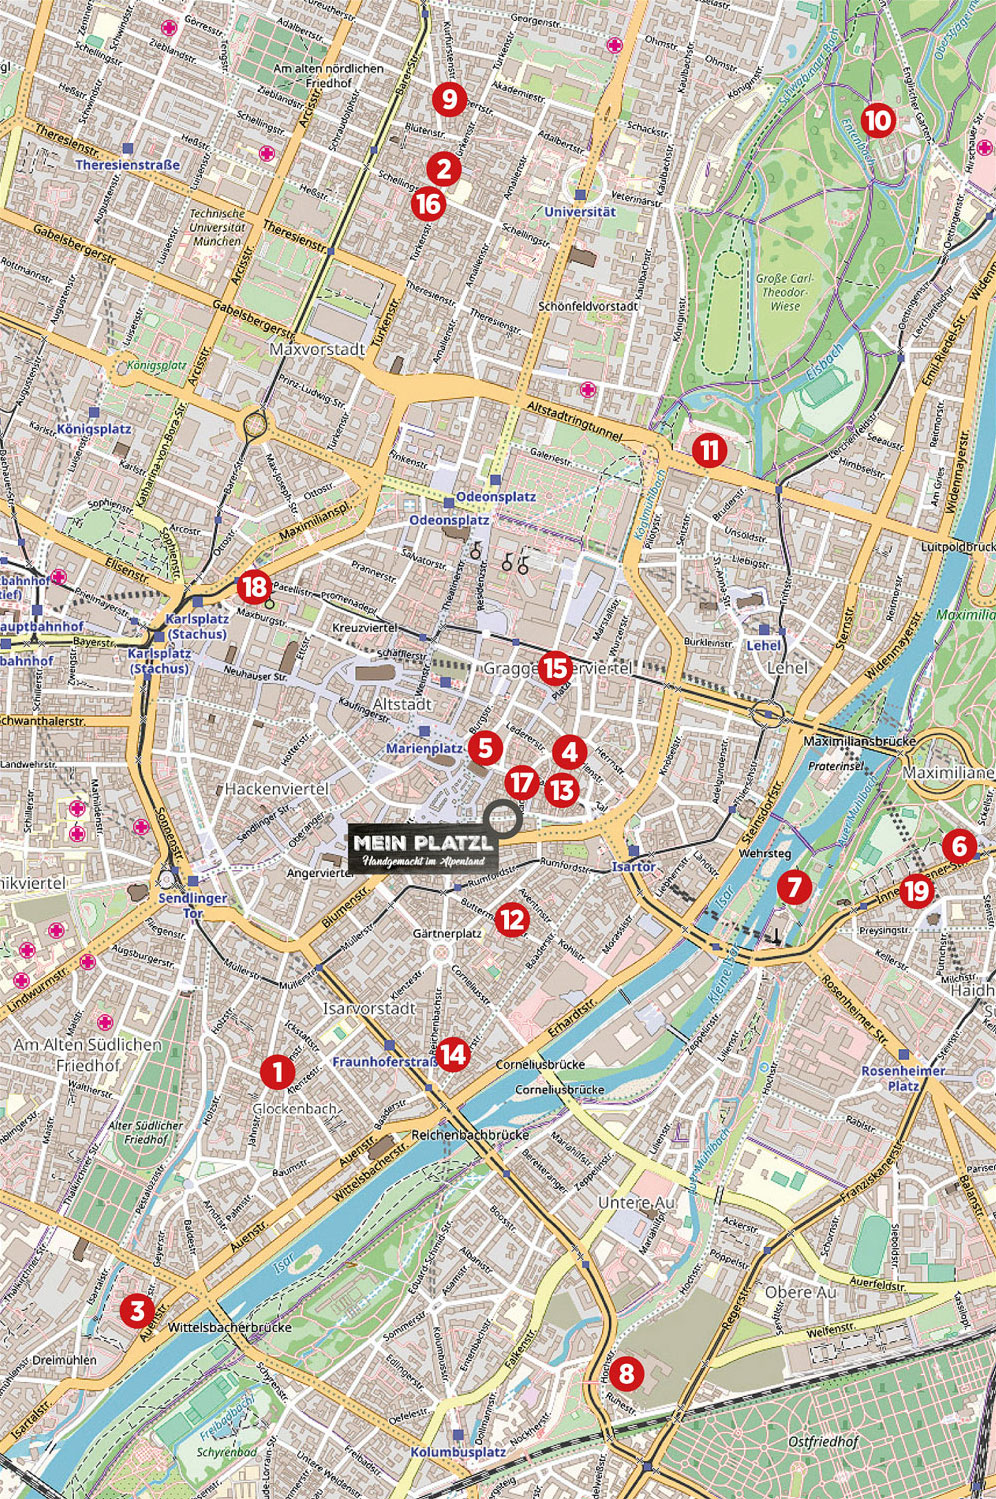 Kartenbasis: © OpenStreetMap-Mitwirkende (CC BY-SA 2.0)